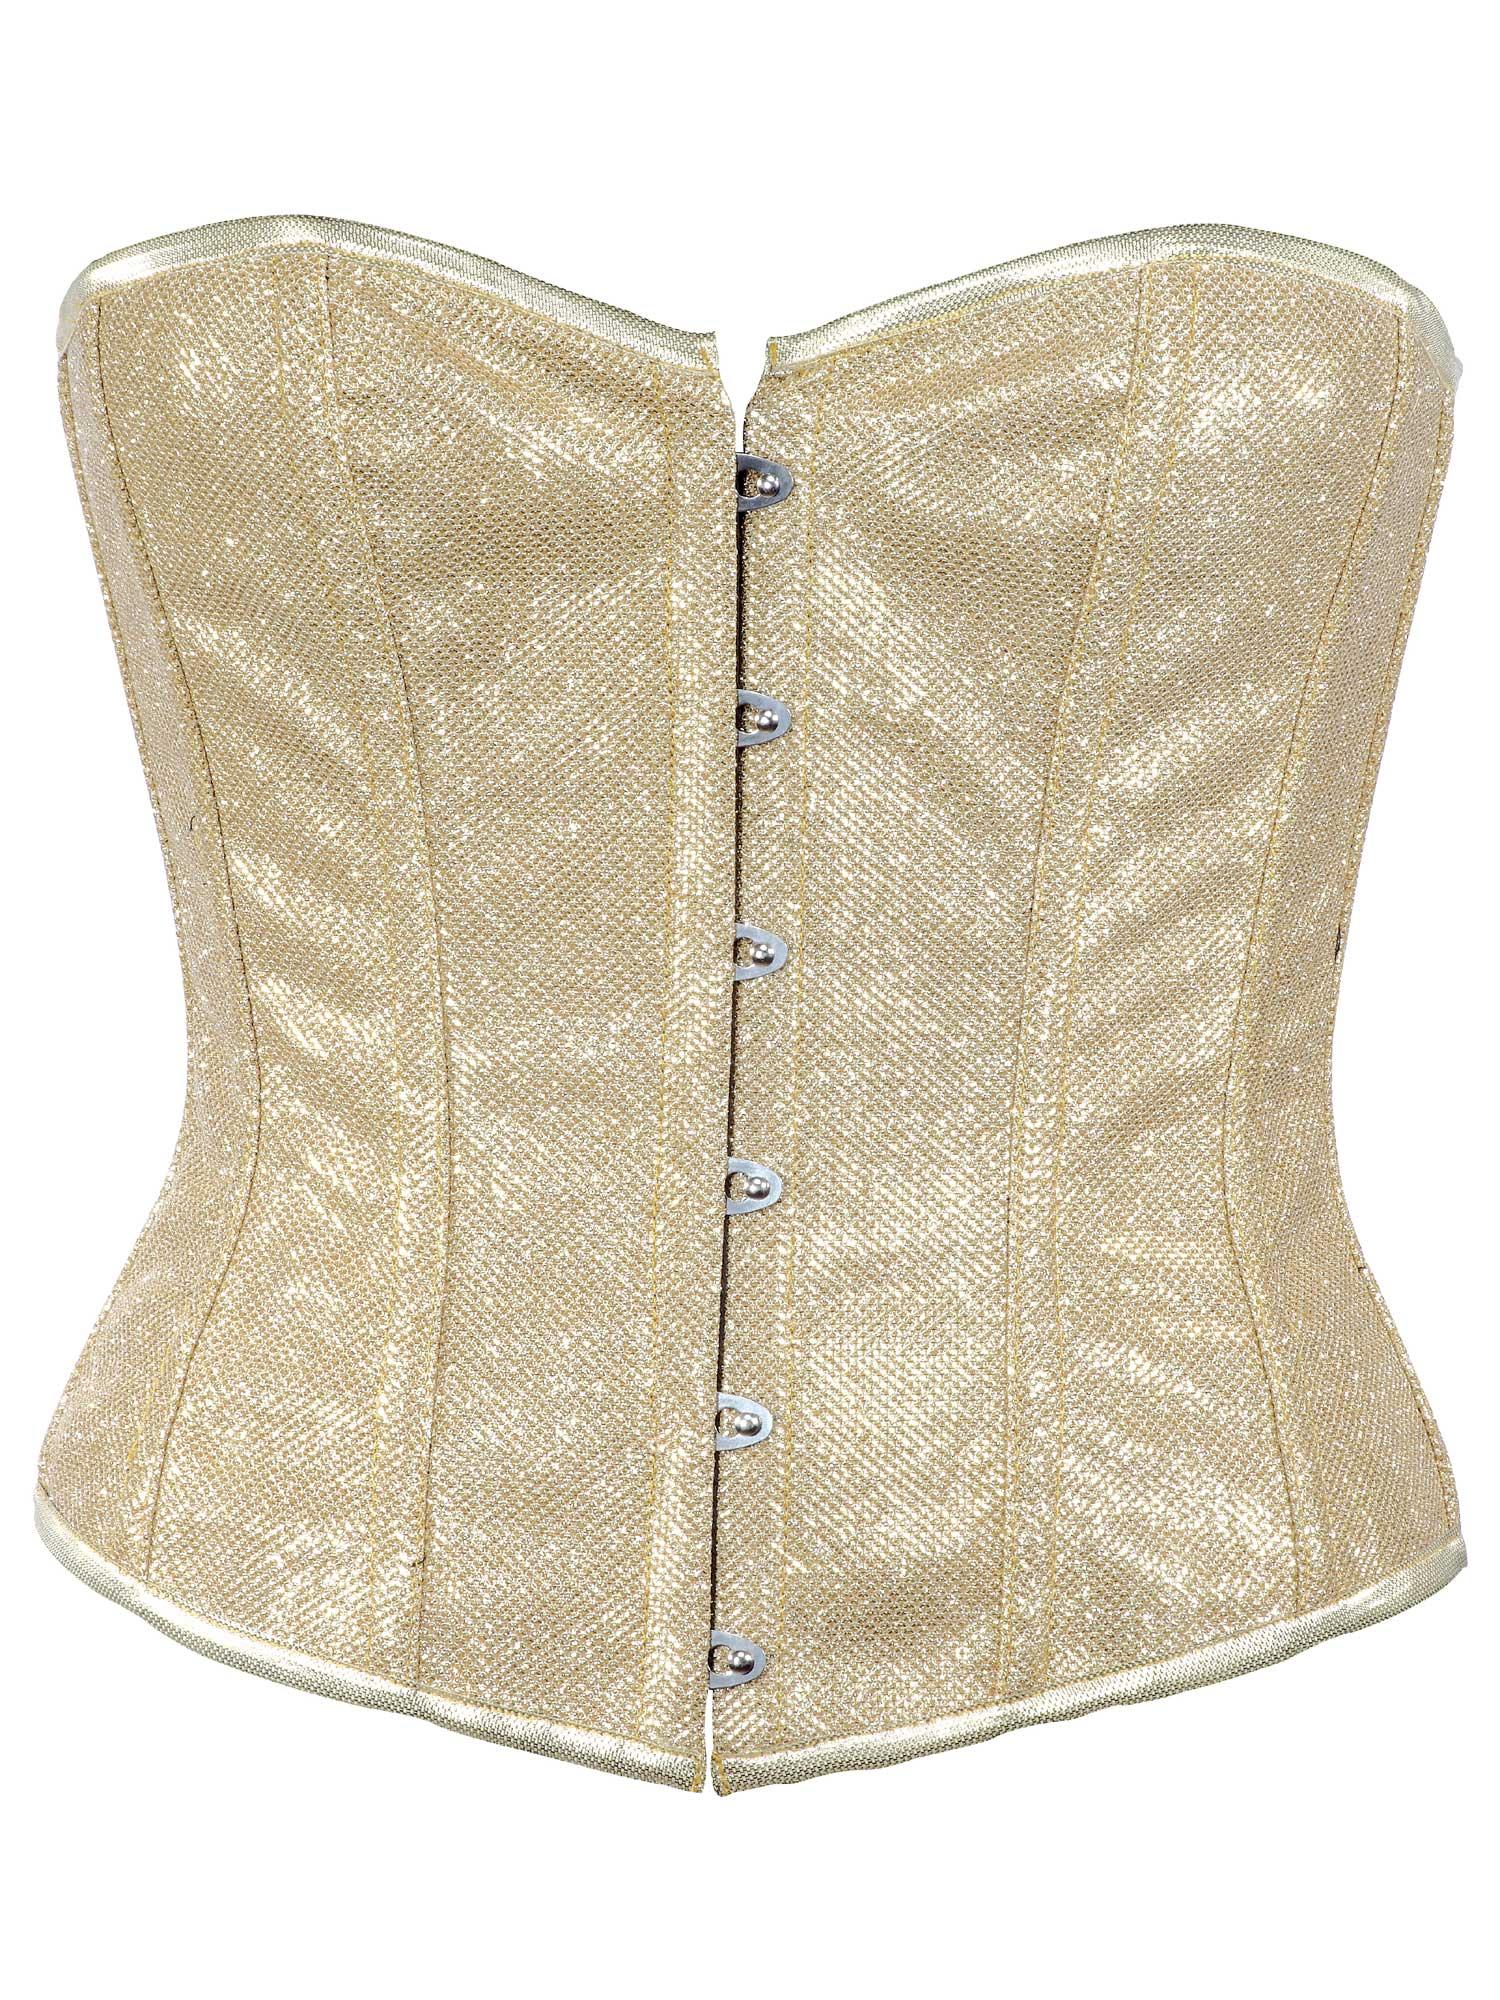 sparkling_gold_fabric_steel_boning_overbust_corset_waist_cincher_bustier_bustiers_and_corsets_5.jpg